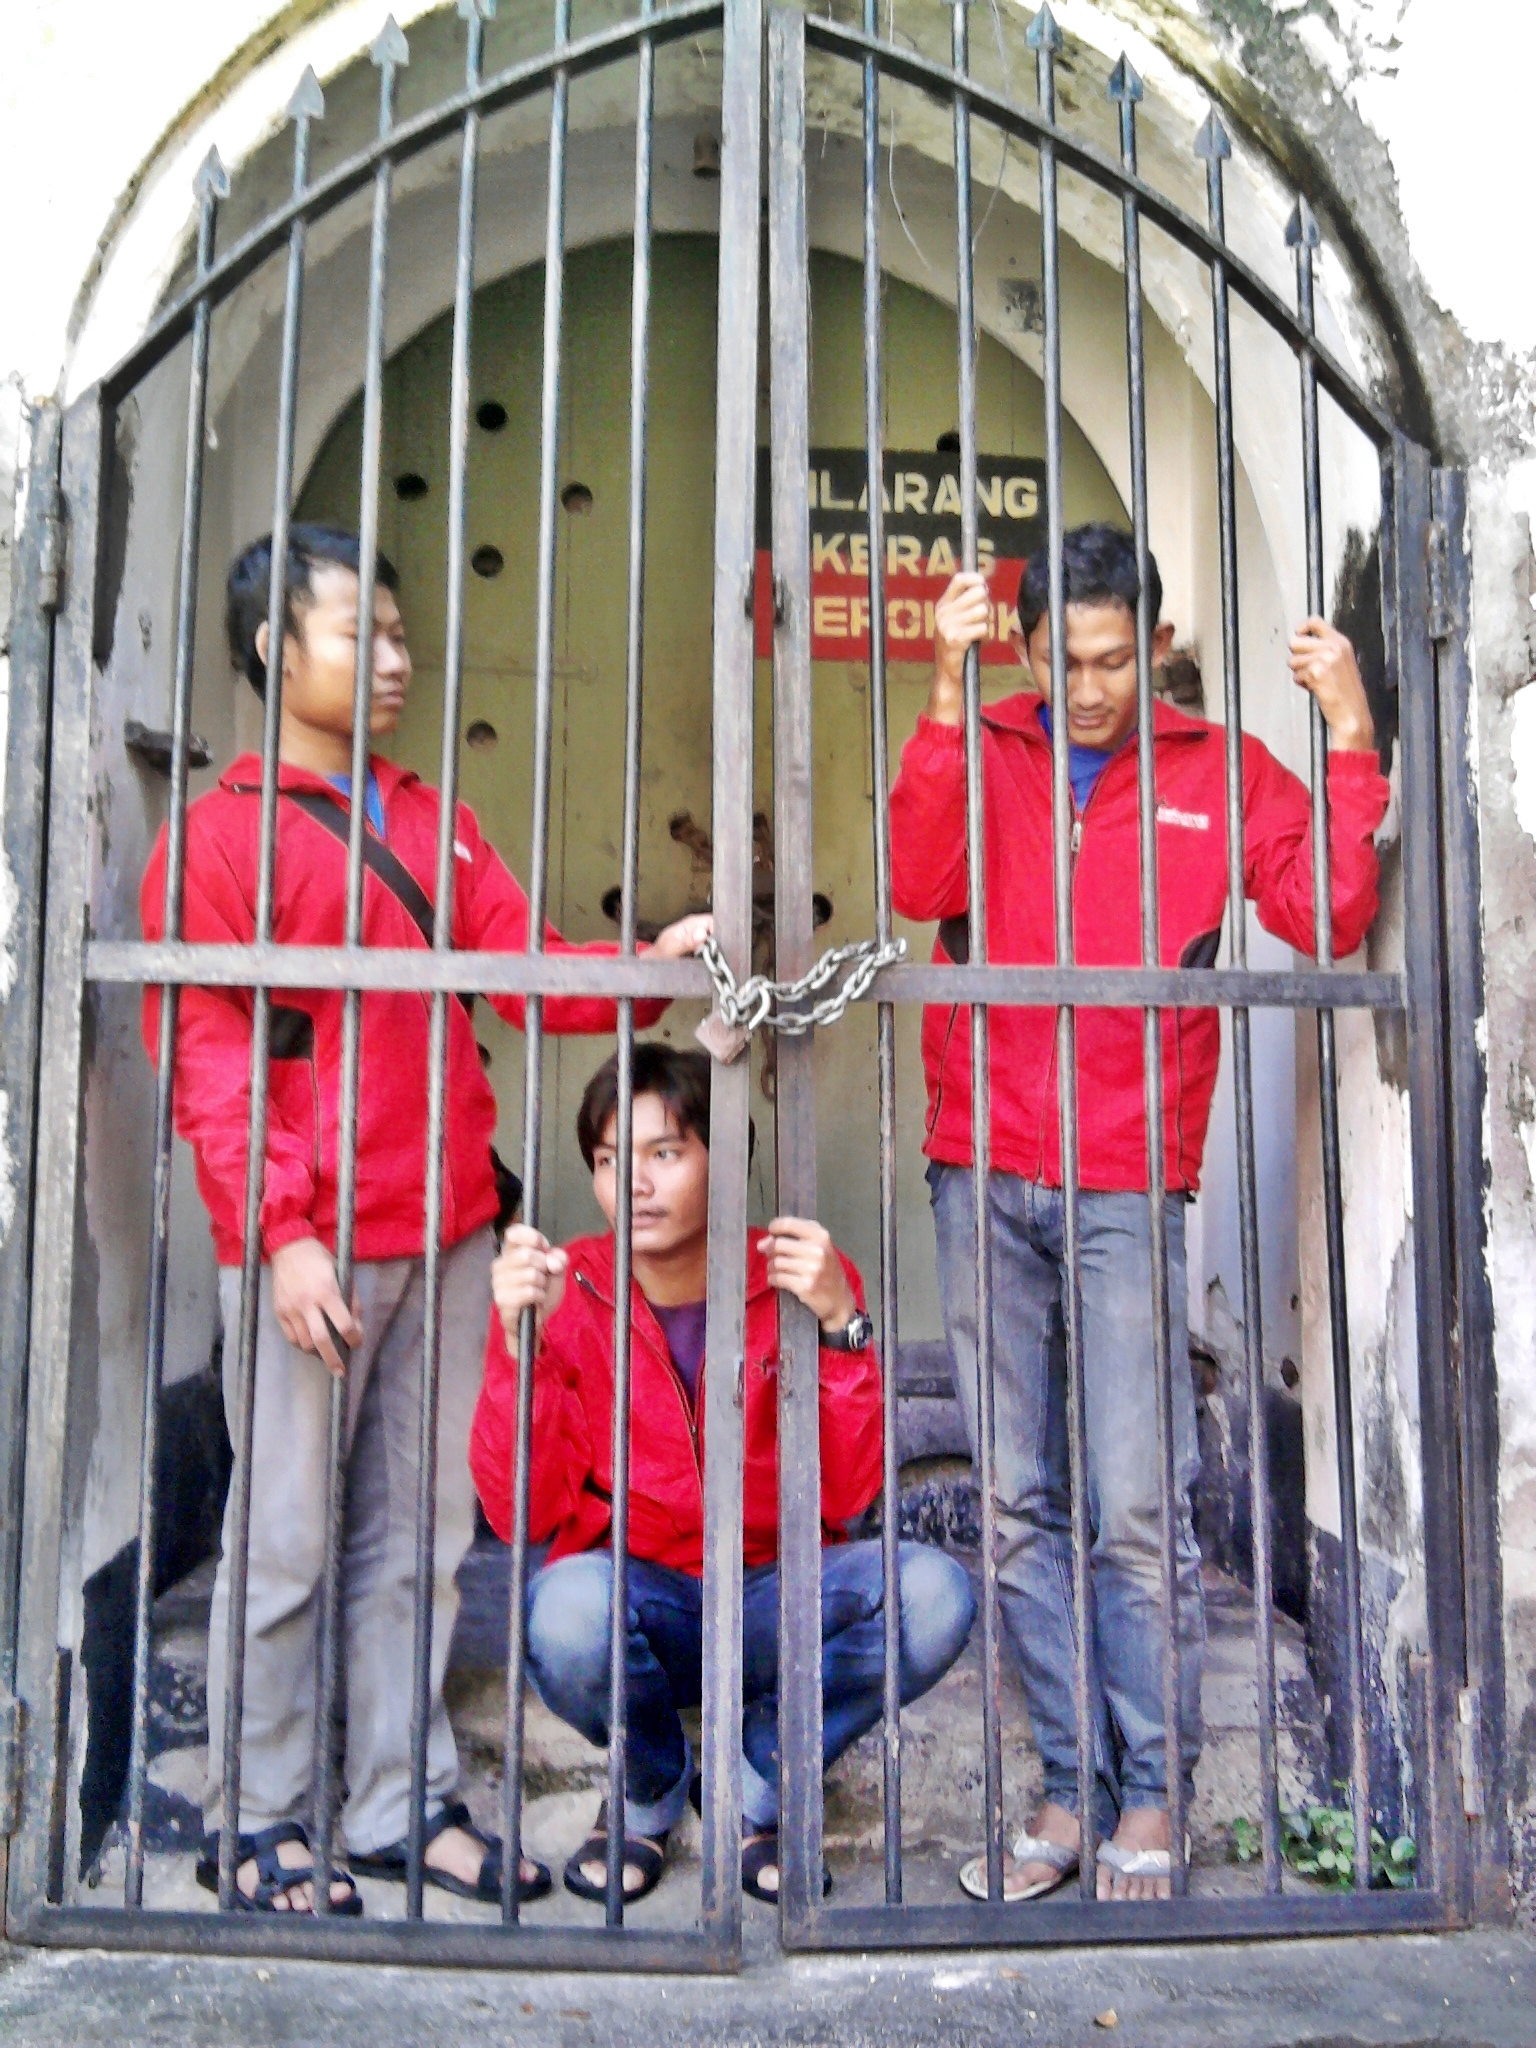 Tahanan Benteng Van Den Bosch Yaenal Zamrinata Kab Ngawi